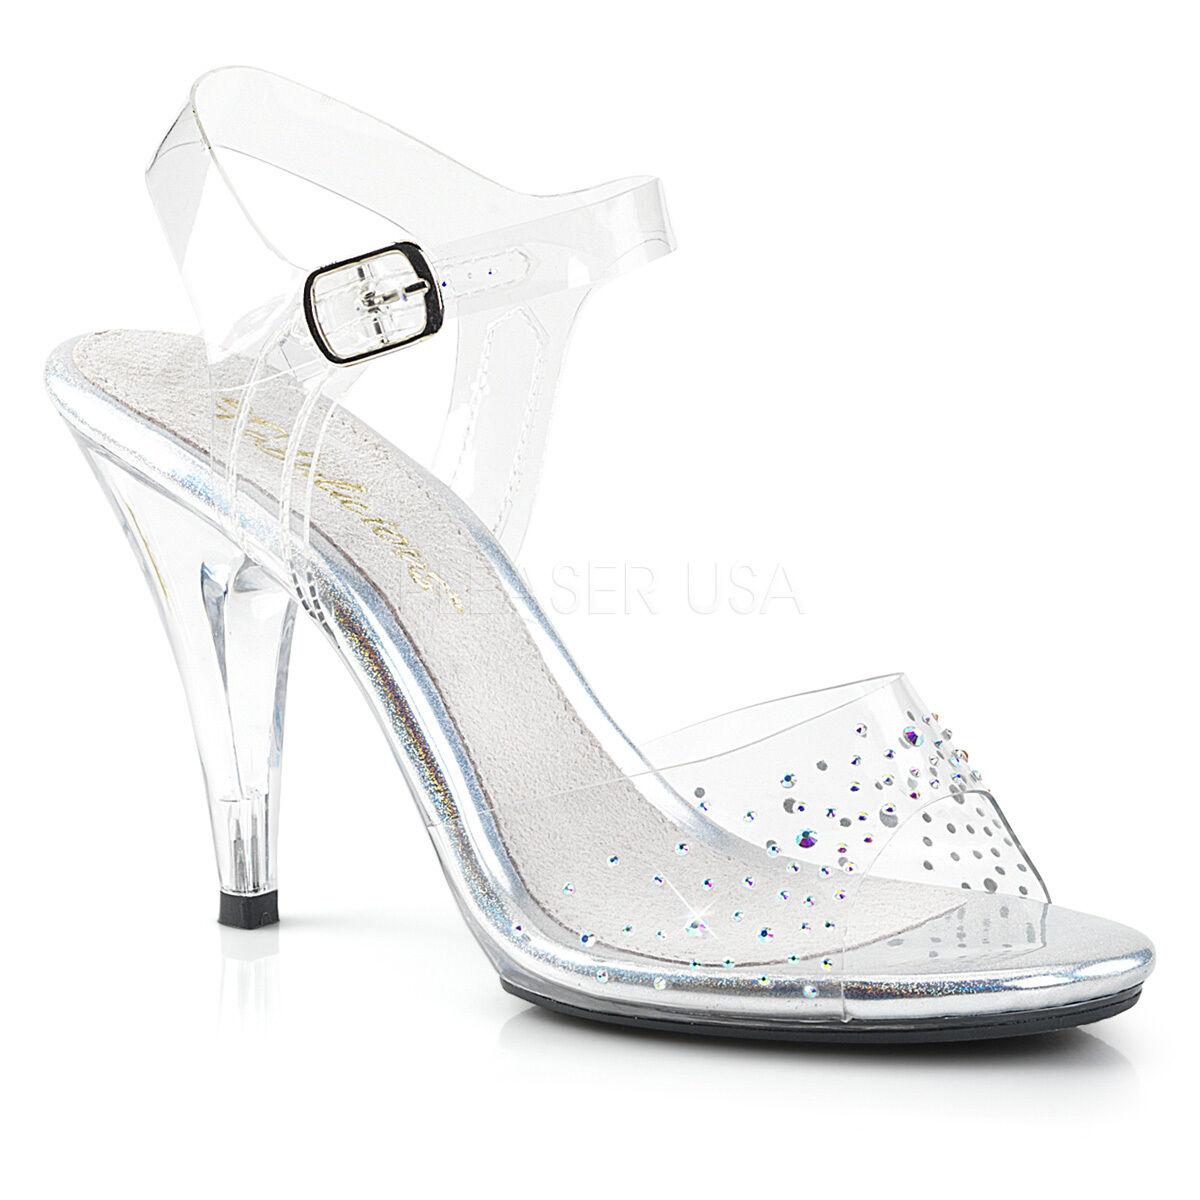 PLEASER Sexy Clear 4  Heel Sandals Ankle Strap Rhinestones Pageant damen schuhe